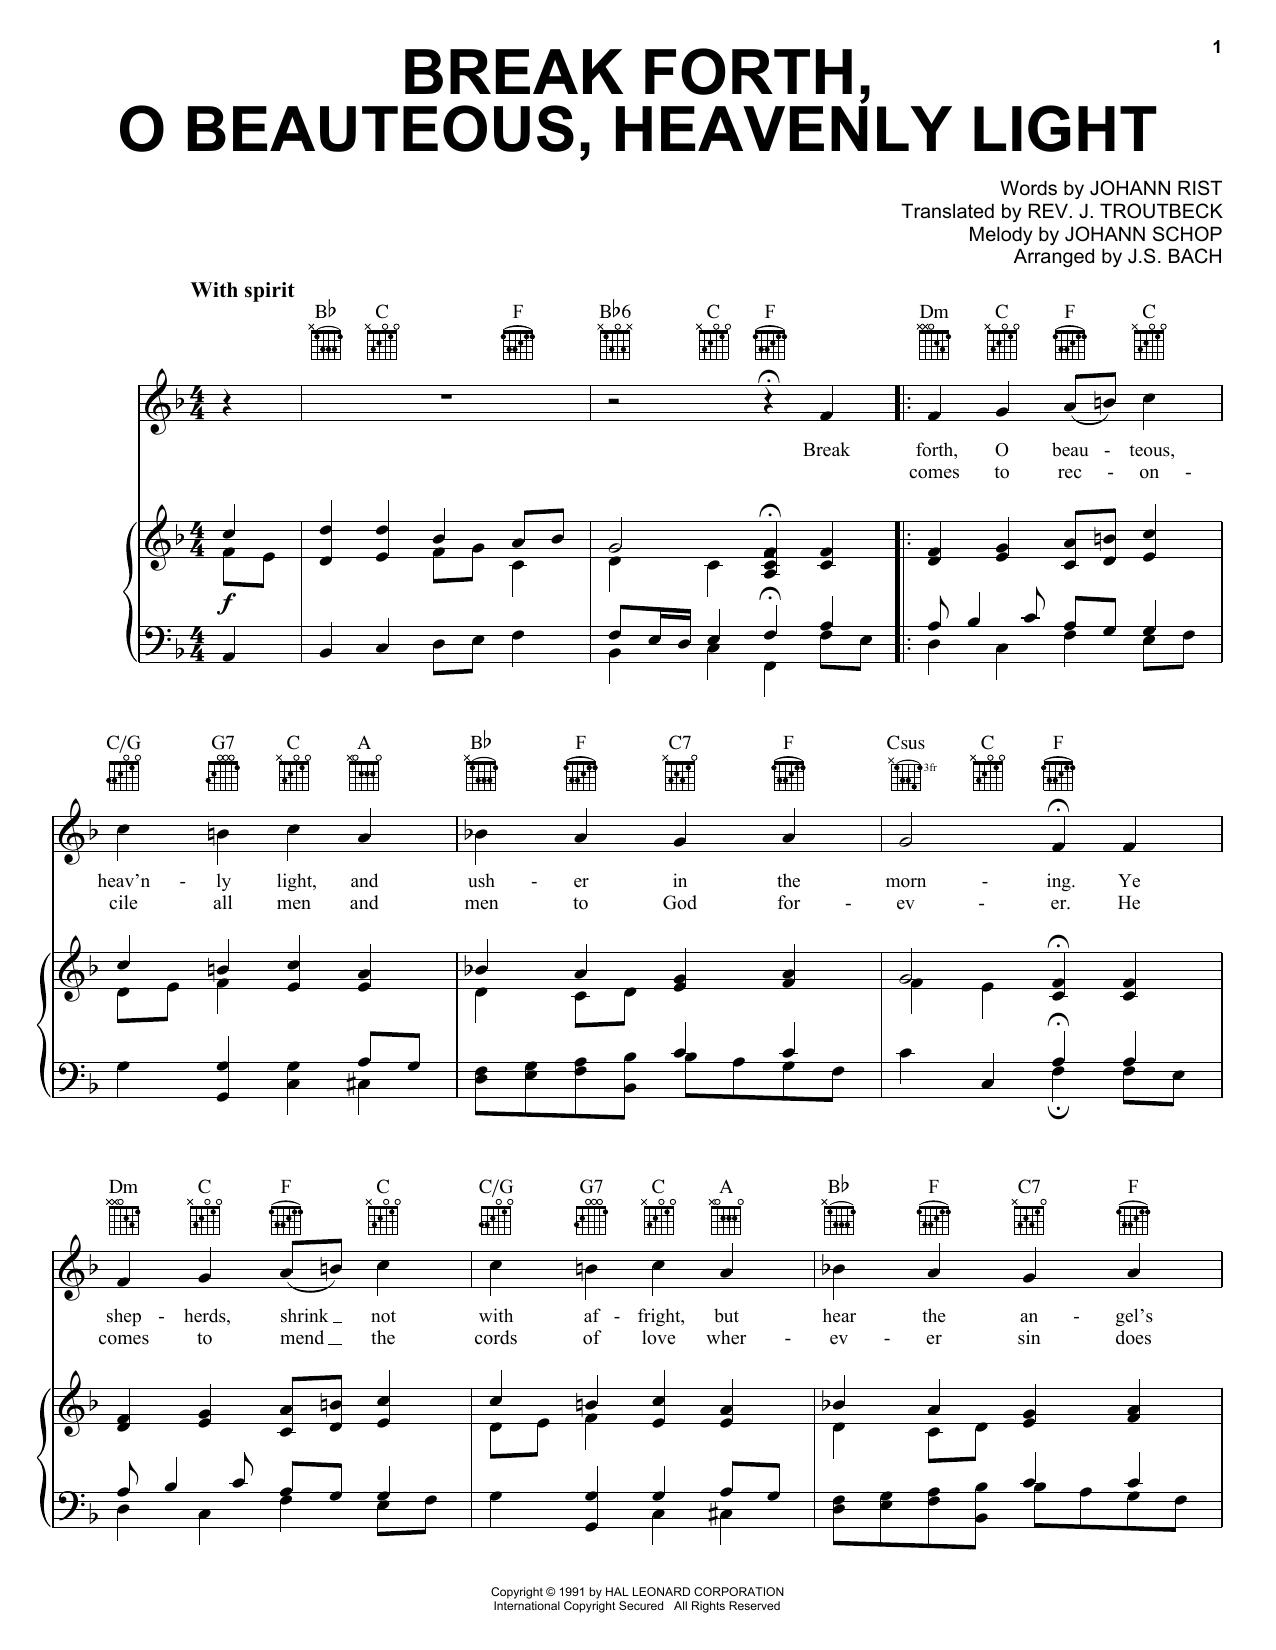 Break Forth, O Beauteous, Heavenly Light Sheet Music